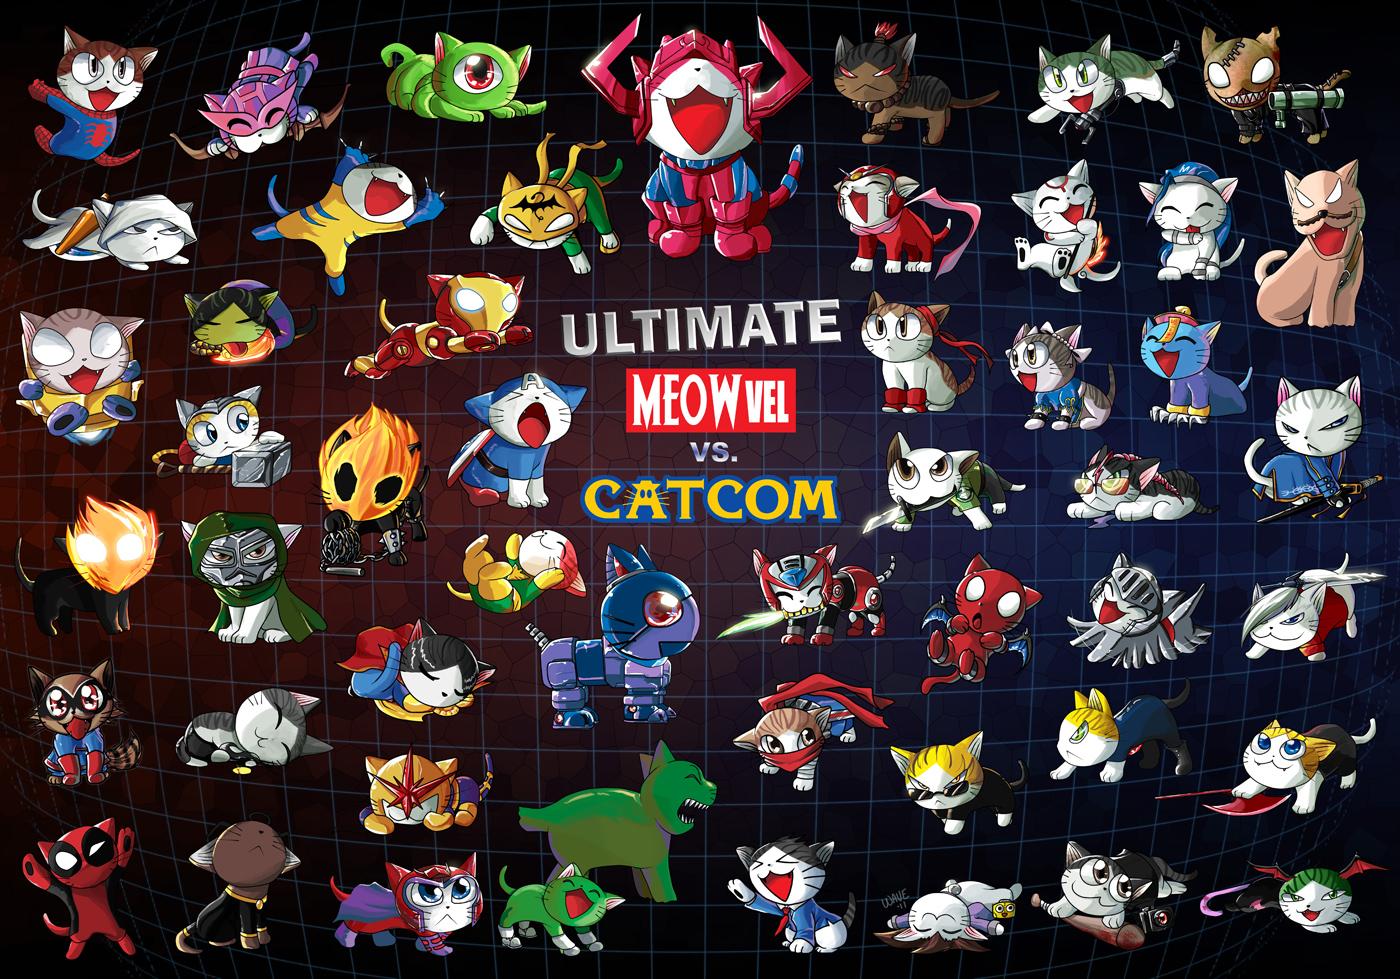 ultimate_meowvel_vs_catcom_3_by_suzuran-d3b6we9.jpg